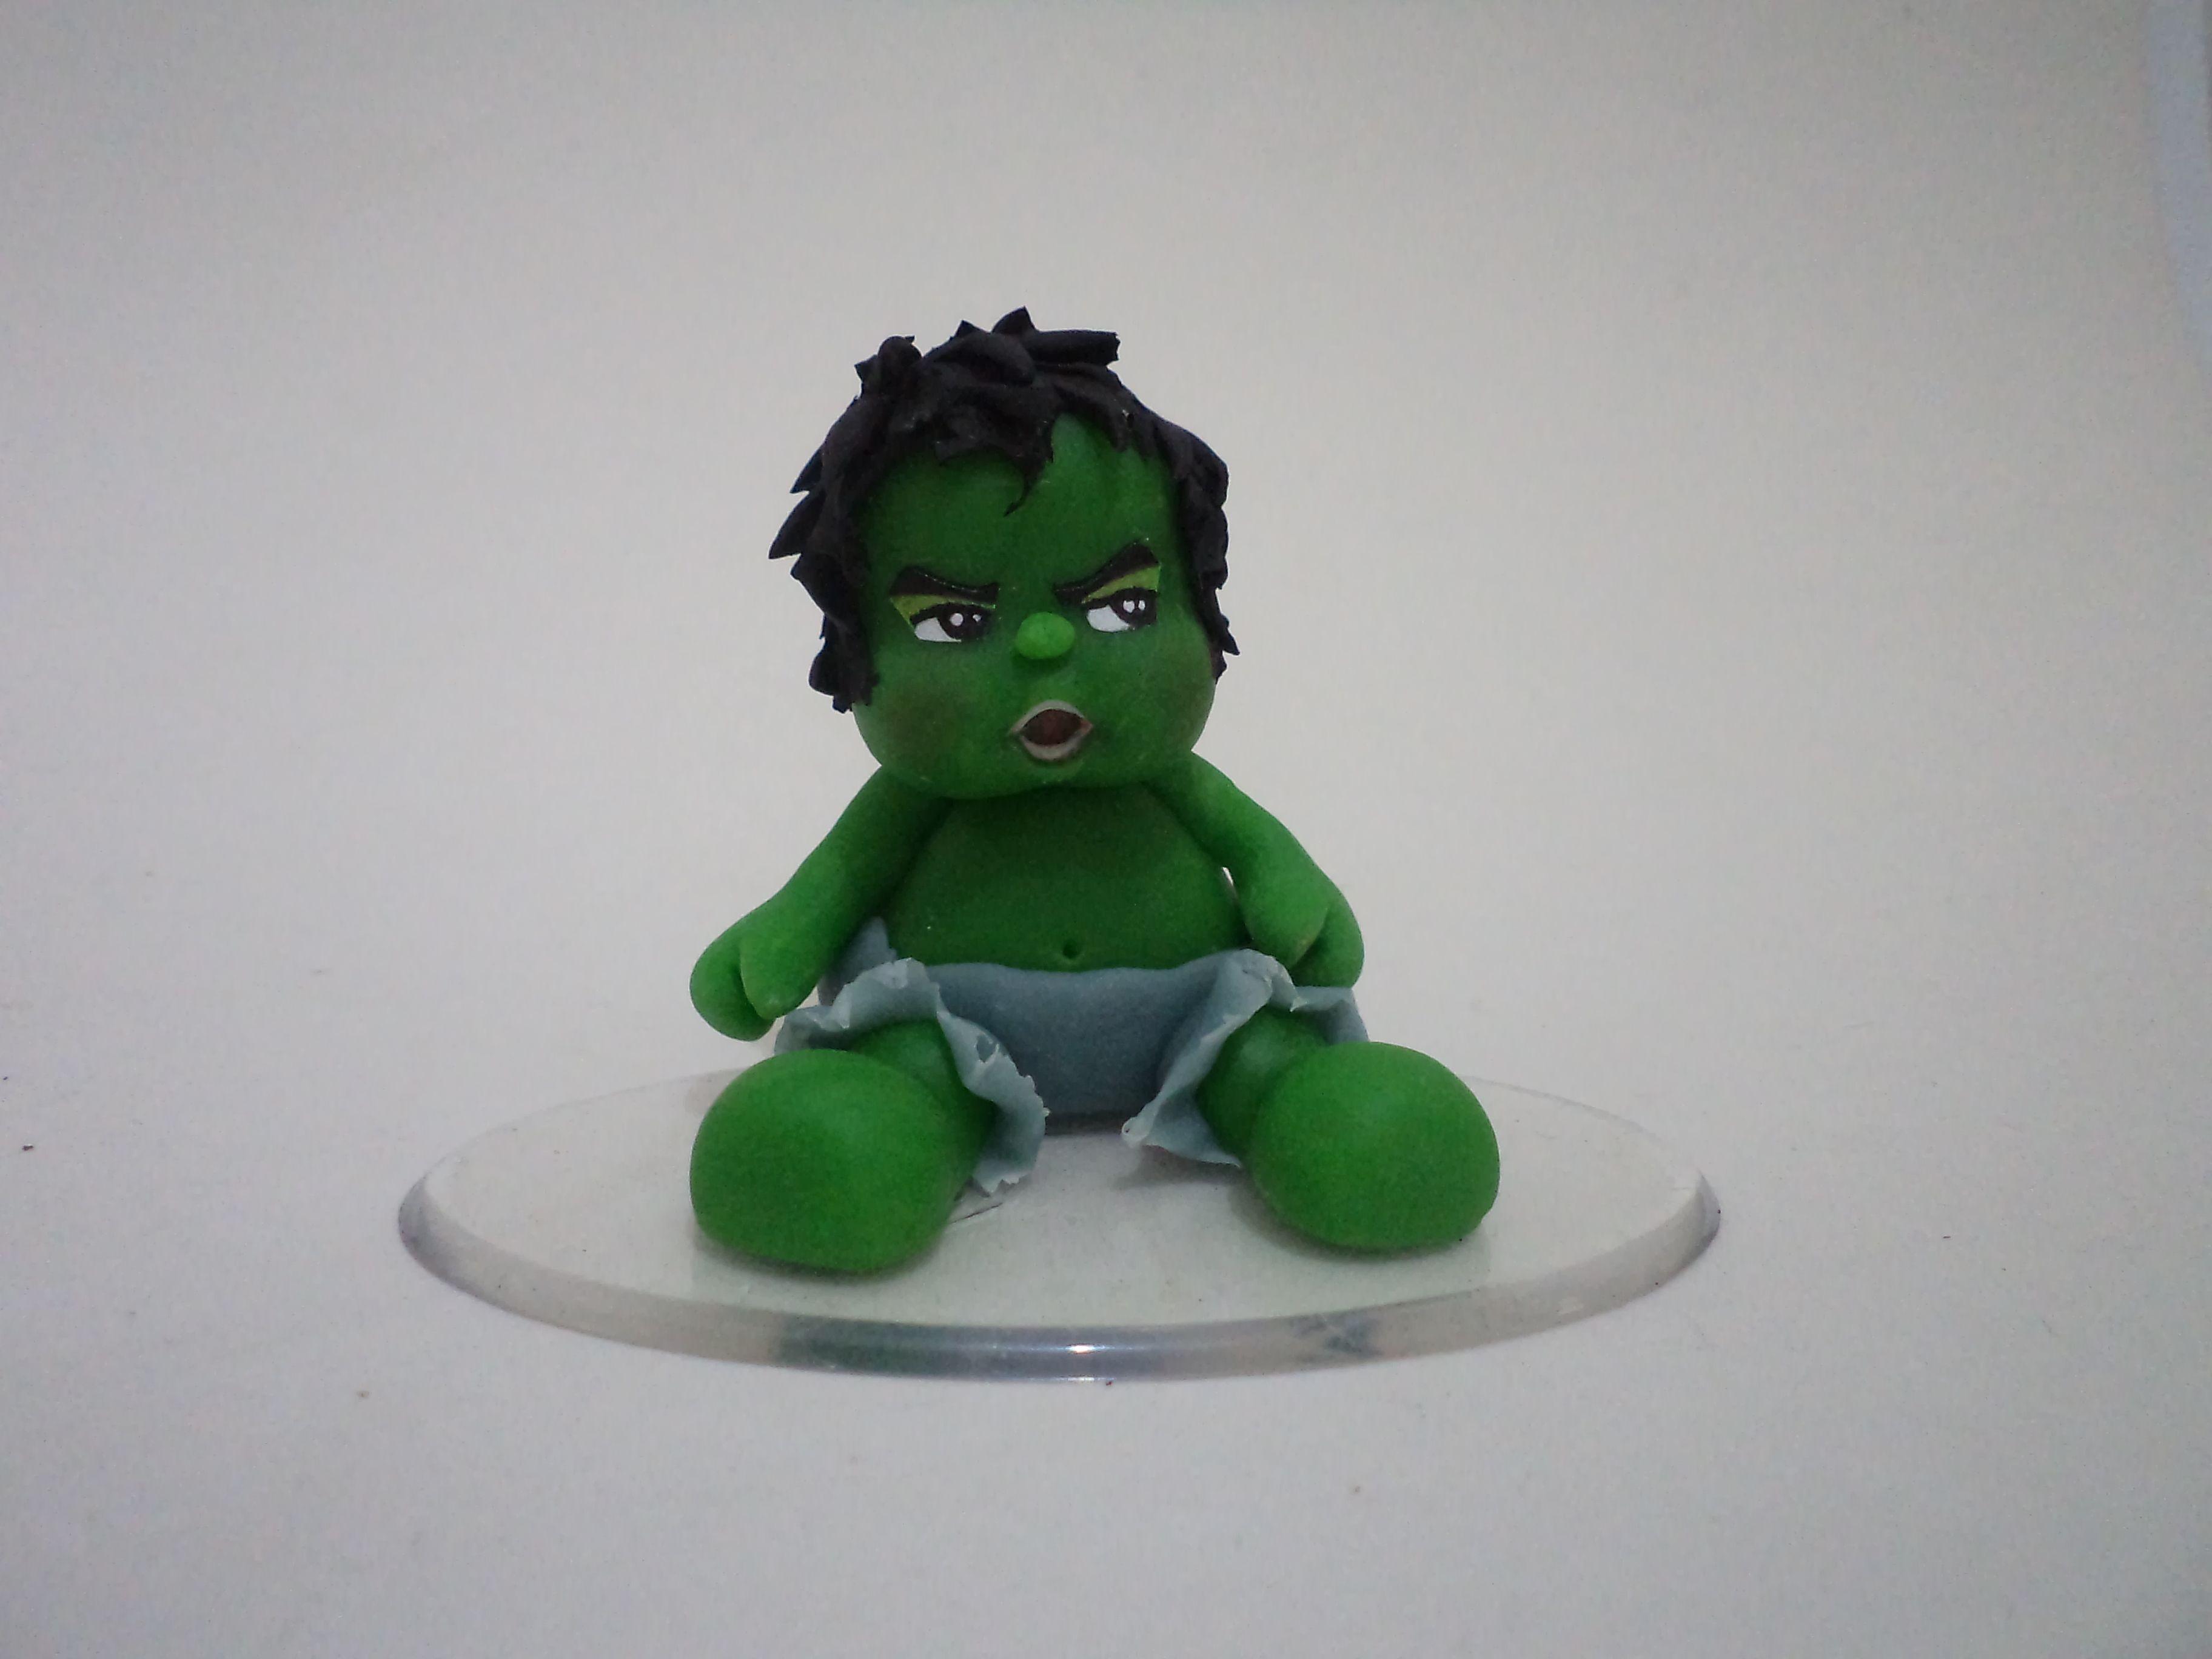 Incrivel Hulck Pretty incrível hulk infantil, feito com molde de silicone sueli ribas